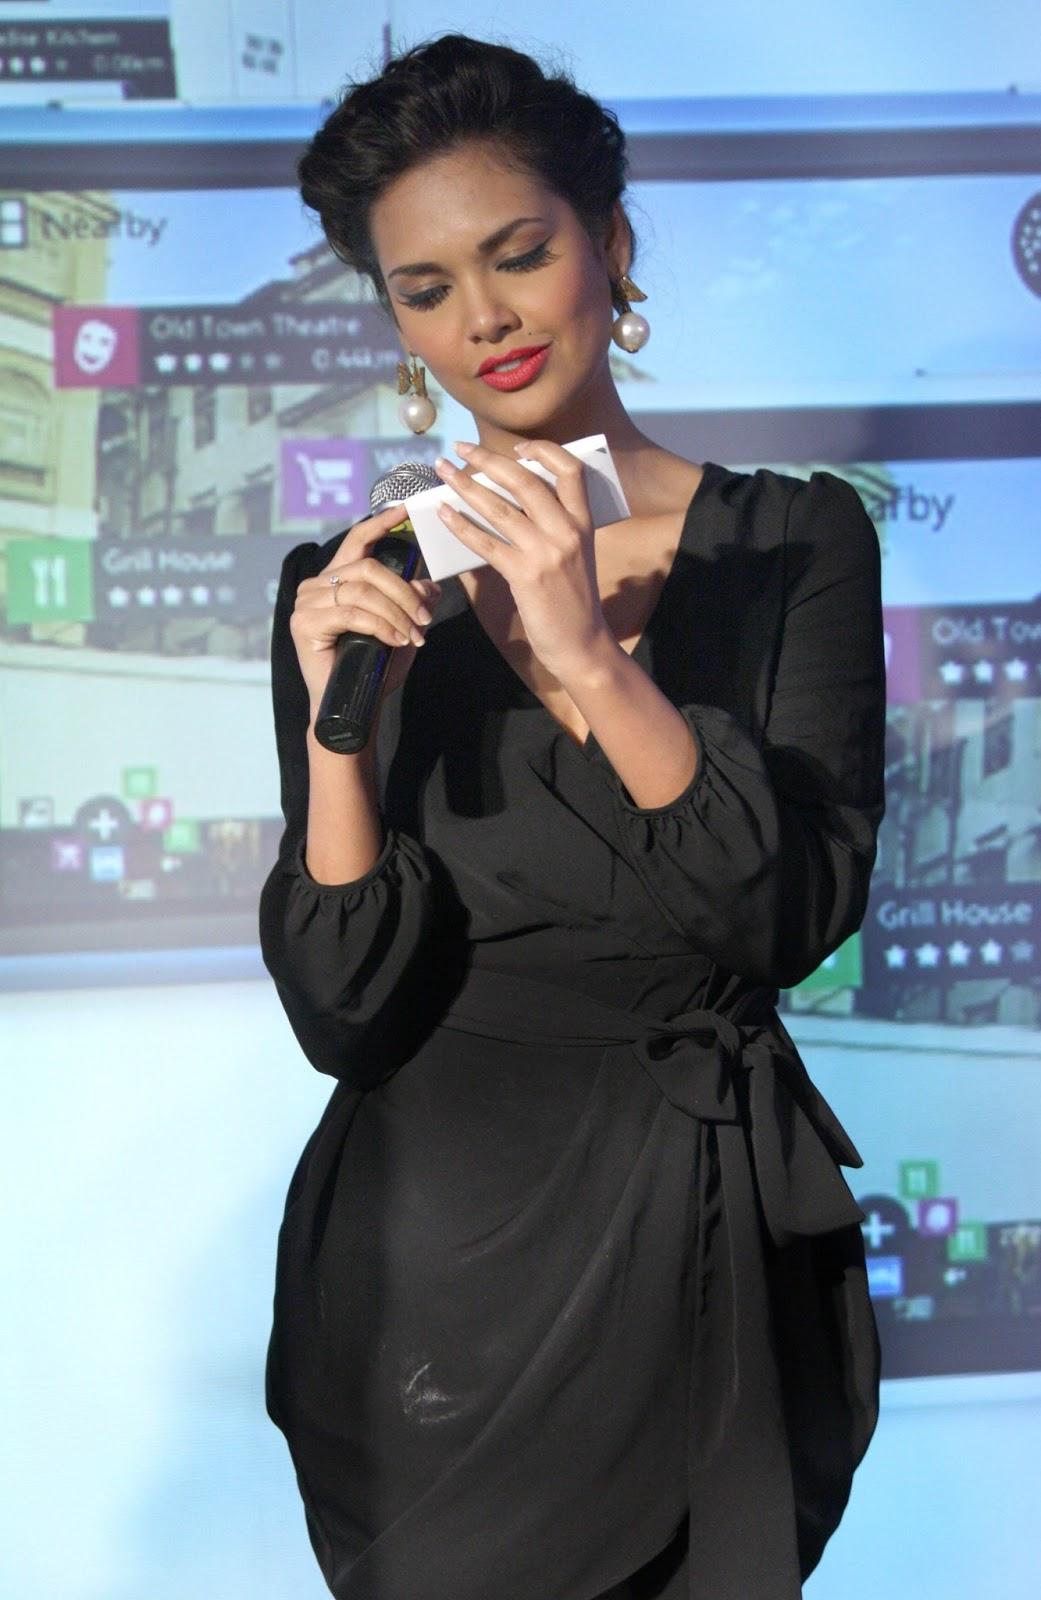 Esha Gupta launches Lumia-900 Nokia Product - Sexy